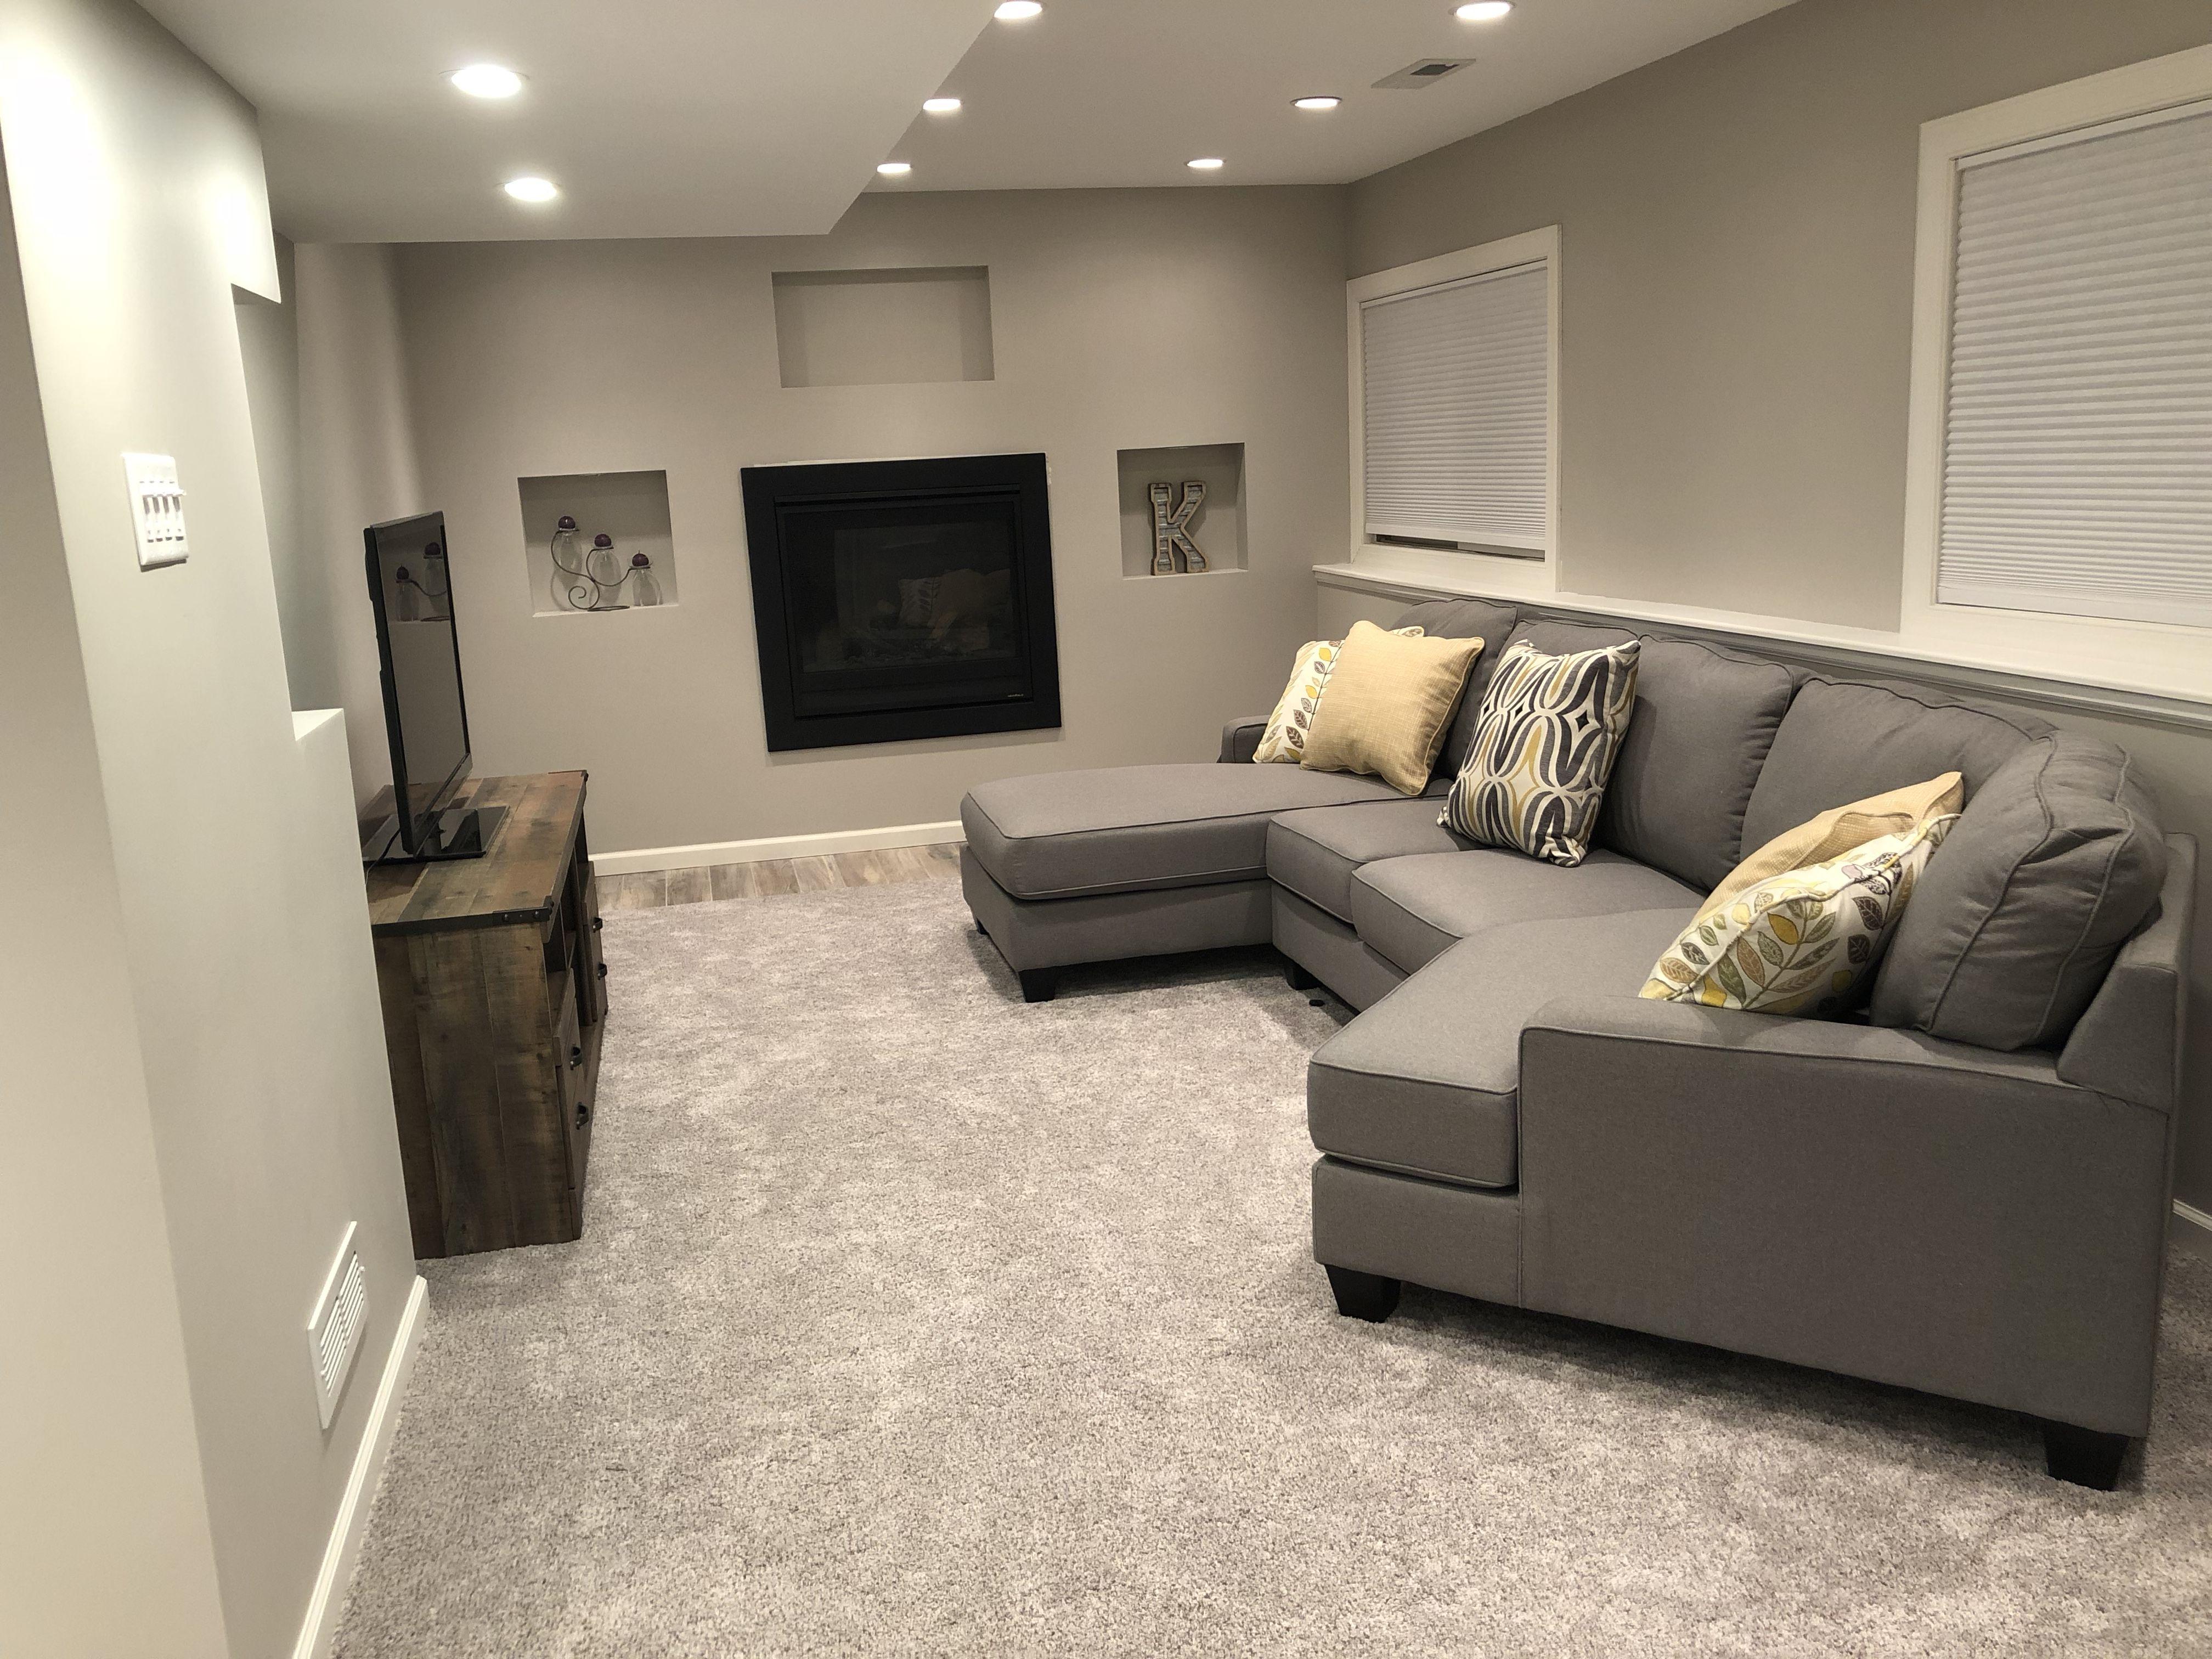 Long Narrow Basement Family Room Minimalist Gray Sectional